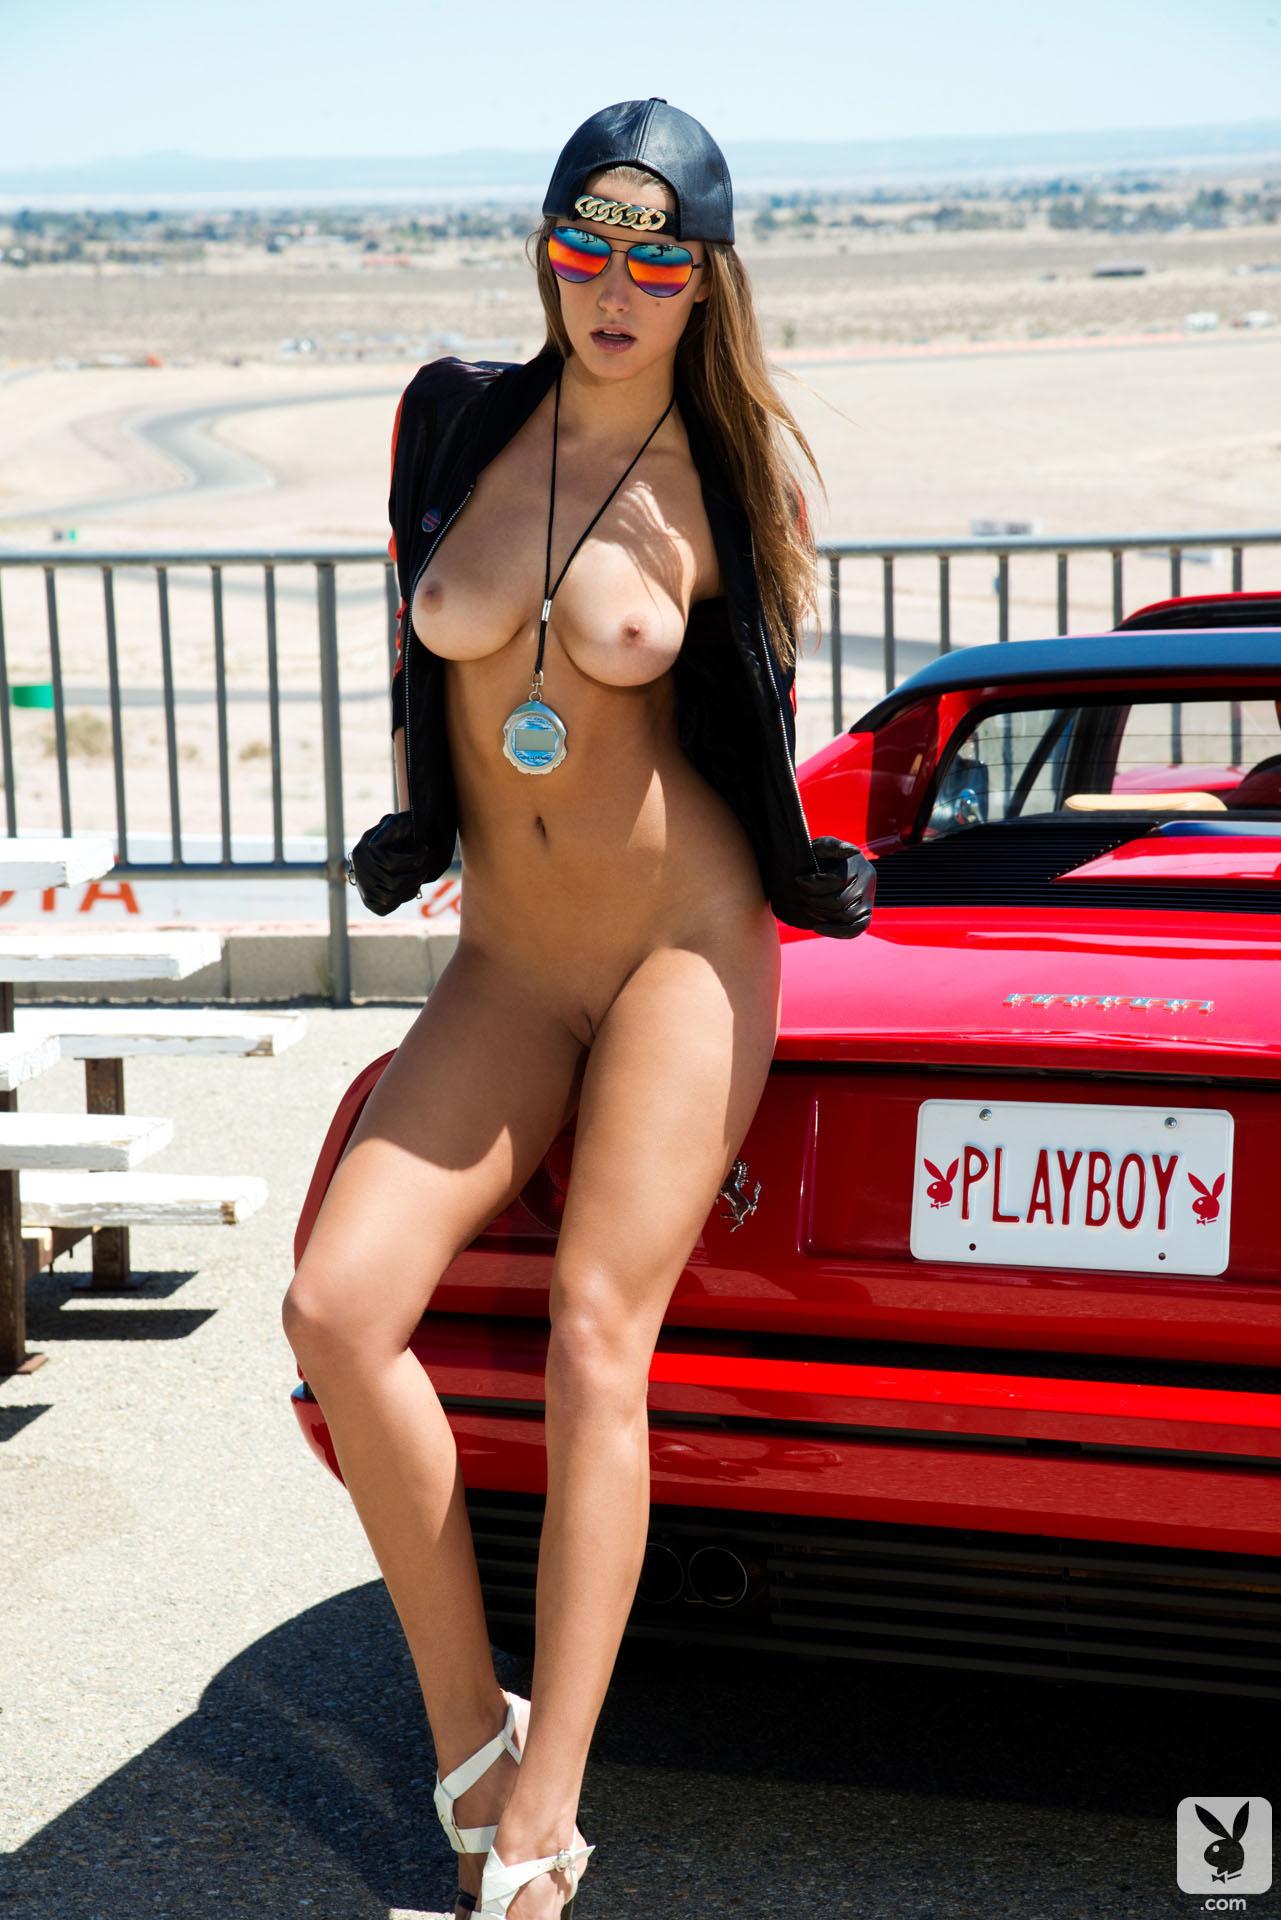 Alyssa Arce Nude Pics alyssa arce nude ferrari 328 playboy 04 redbust